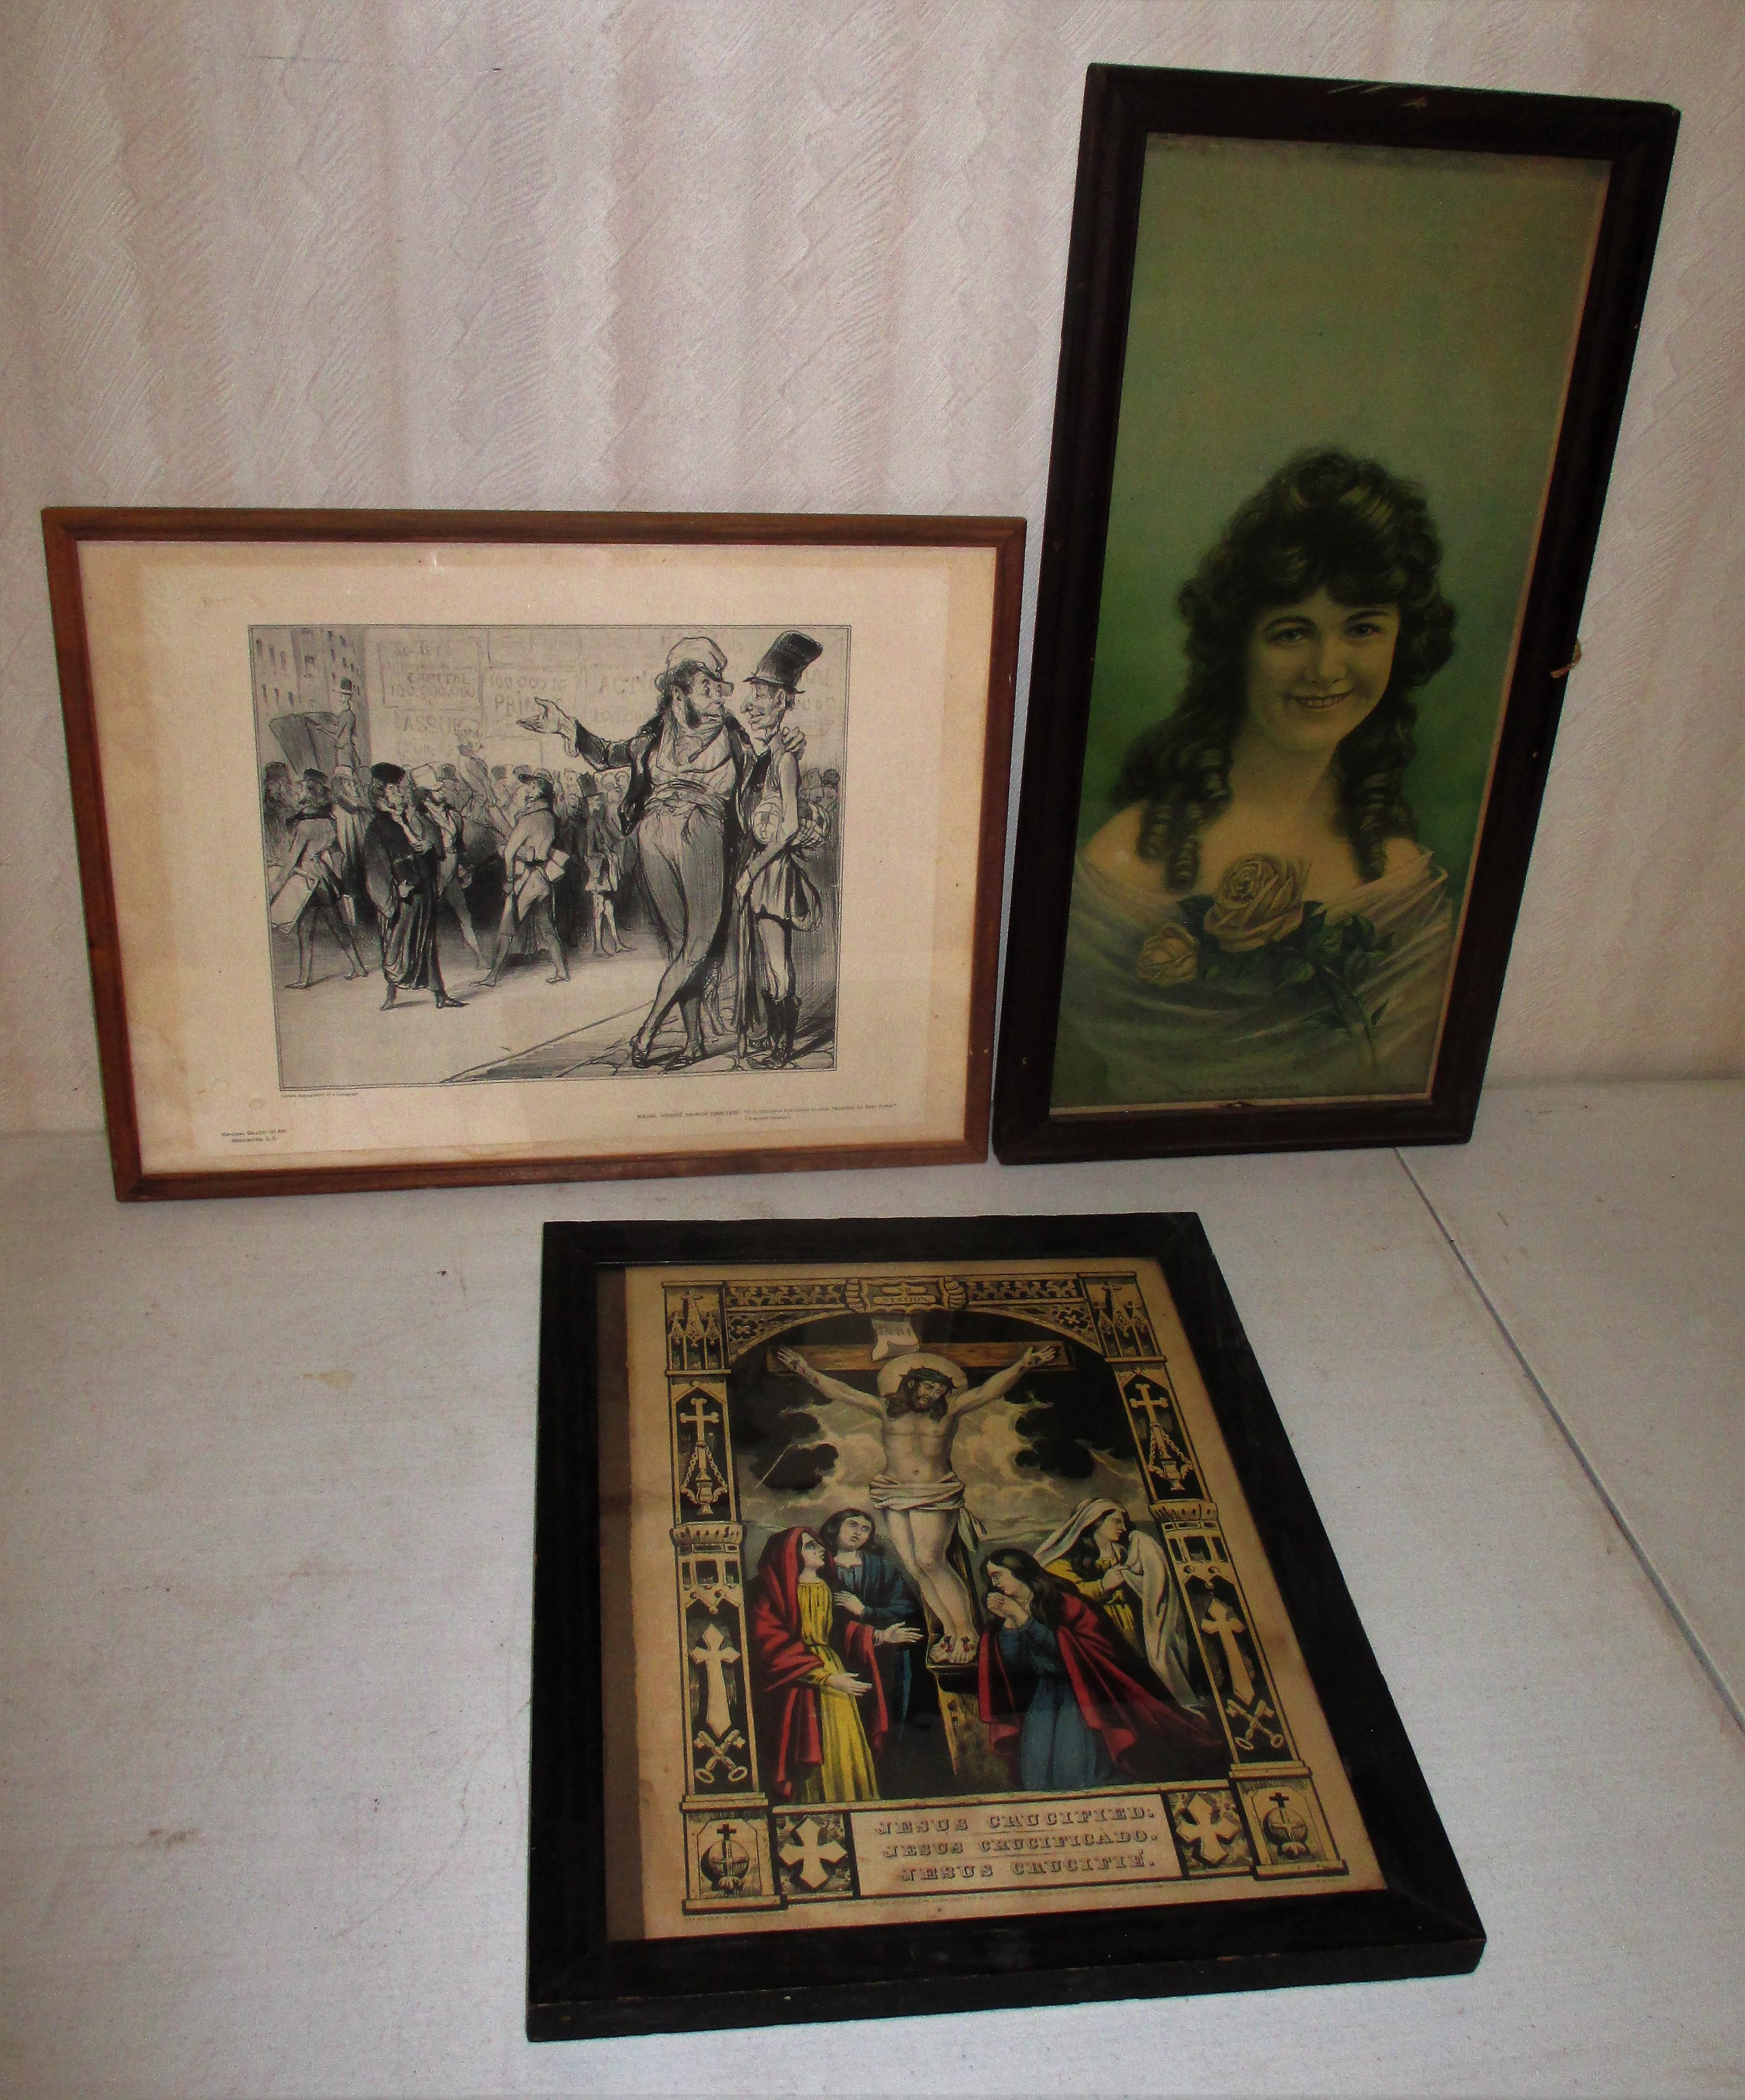 100: (3) Framed Prints, Portrait, Religious, Cartoon